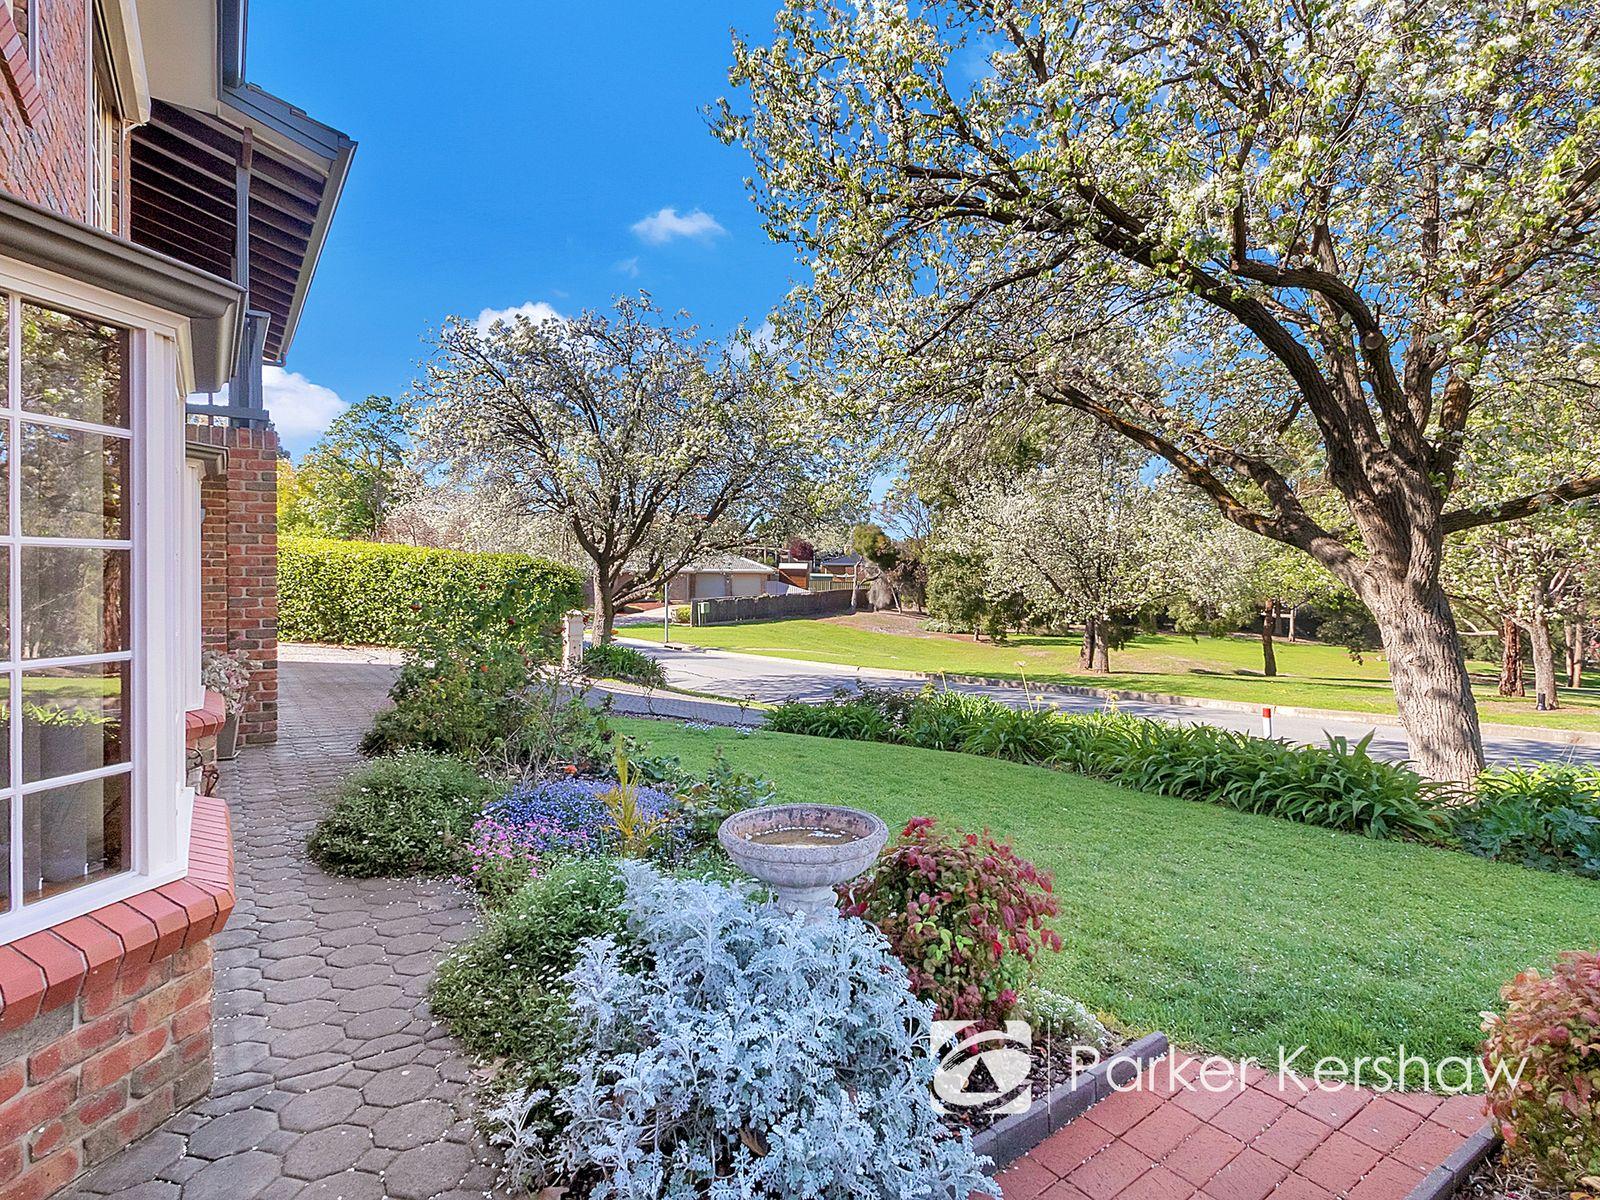 2 San Antonio Court, Wynn Vale, SA 5127